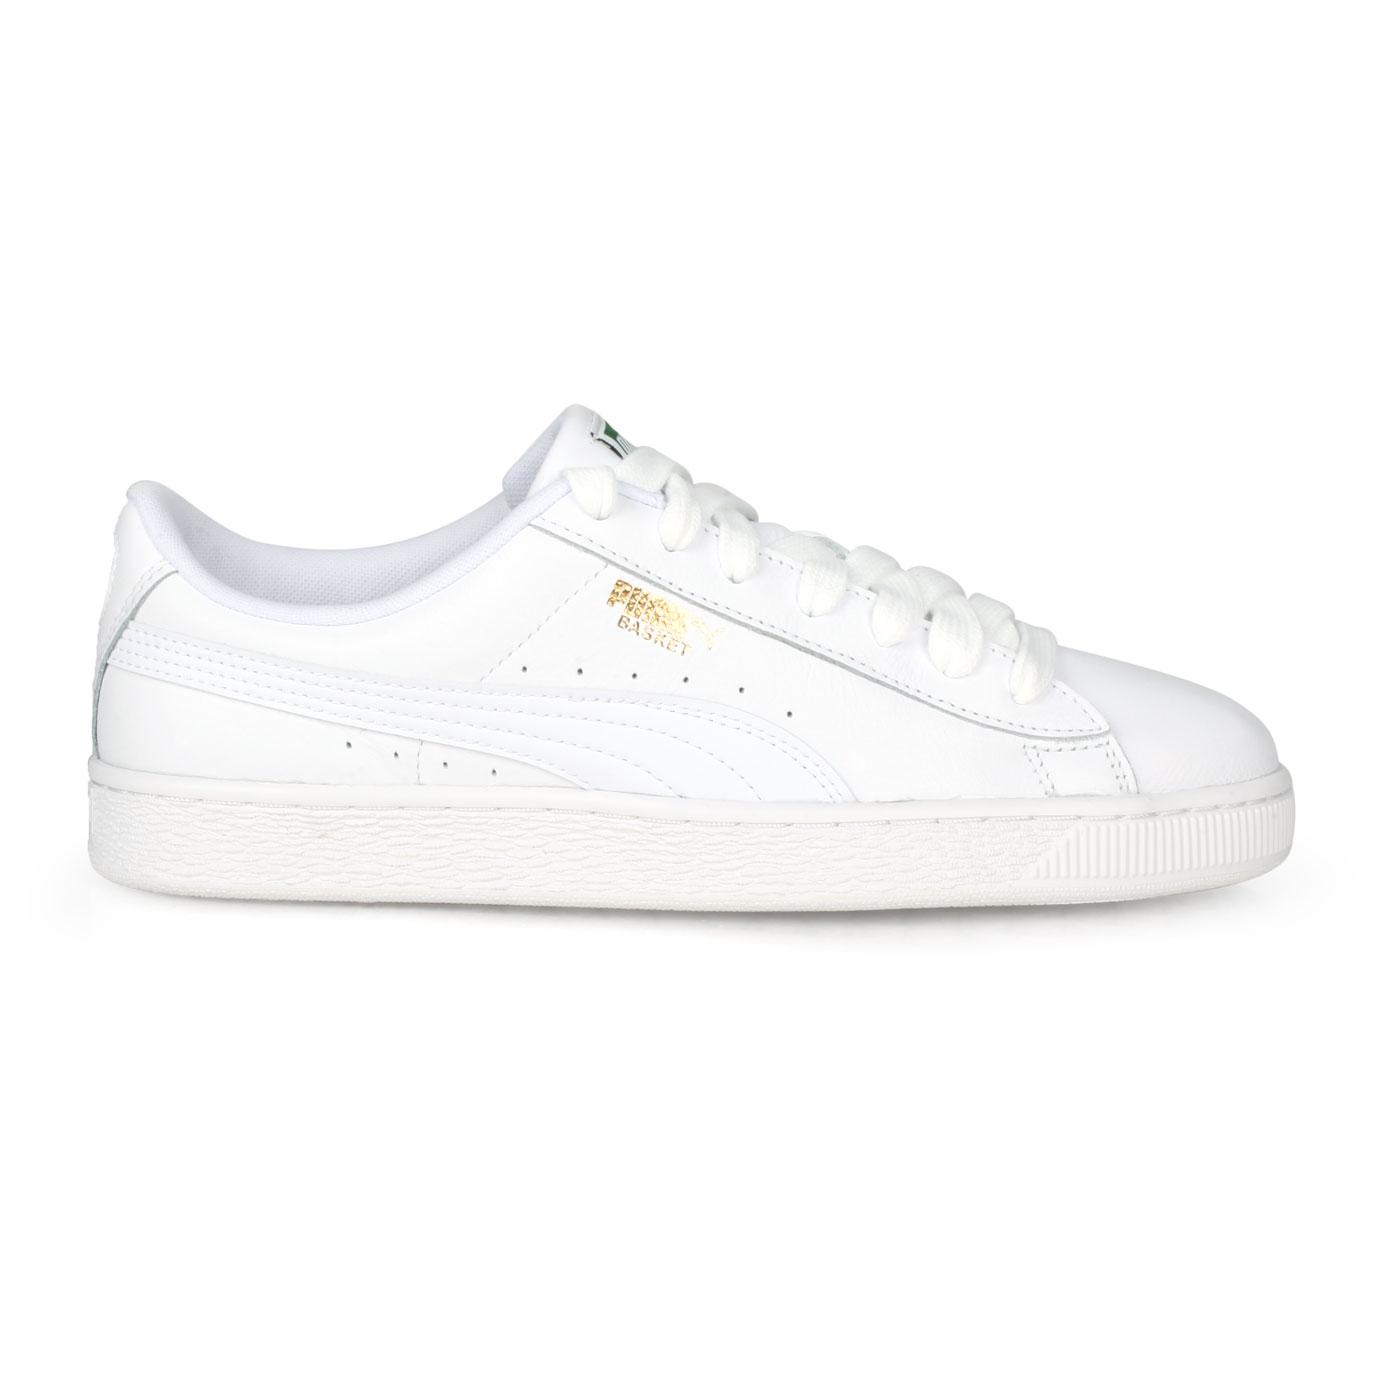 PUMA 經典復古休閒鞋  @BASKET CLASSIC LFS@35436717 - 白金